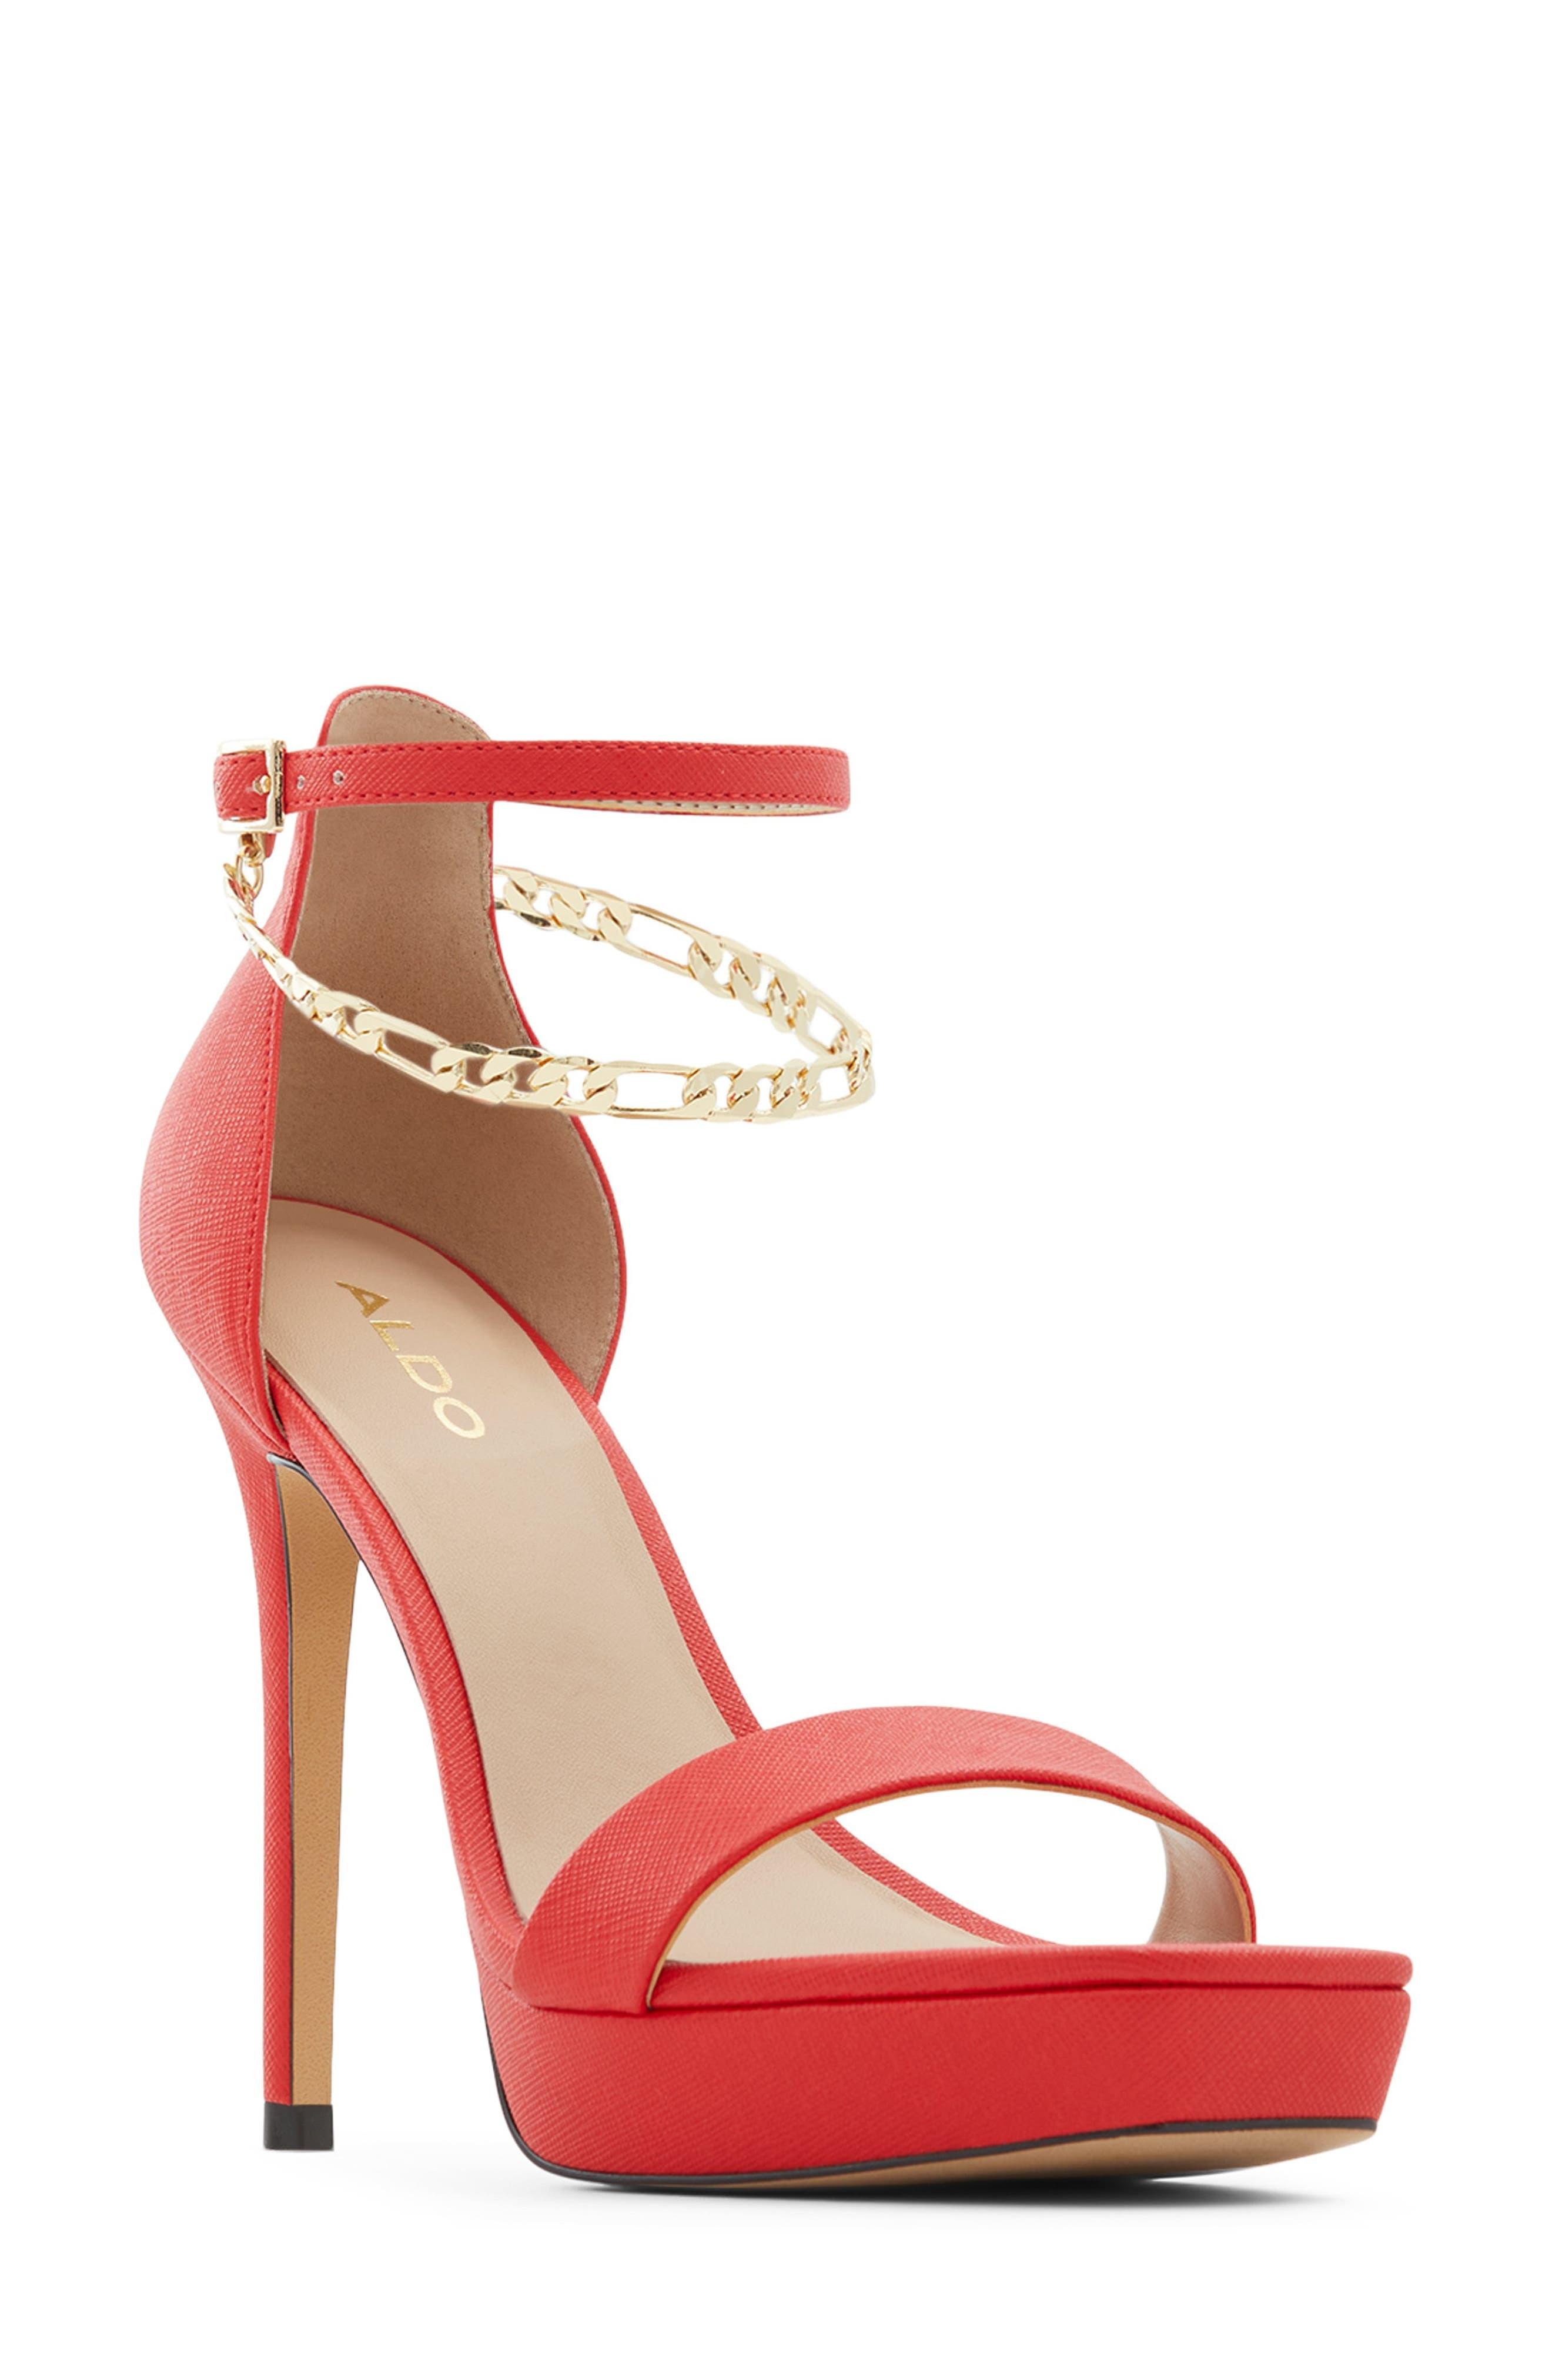 Scarettchain Sandal